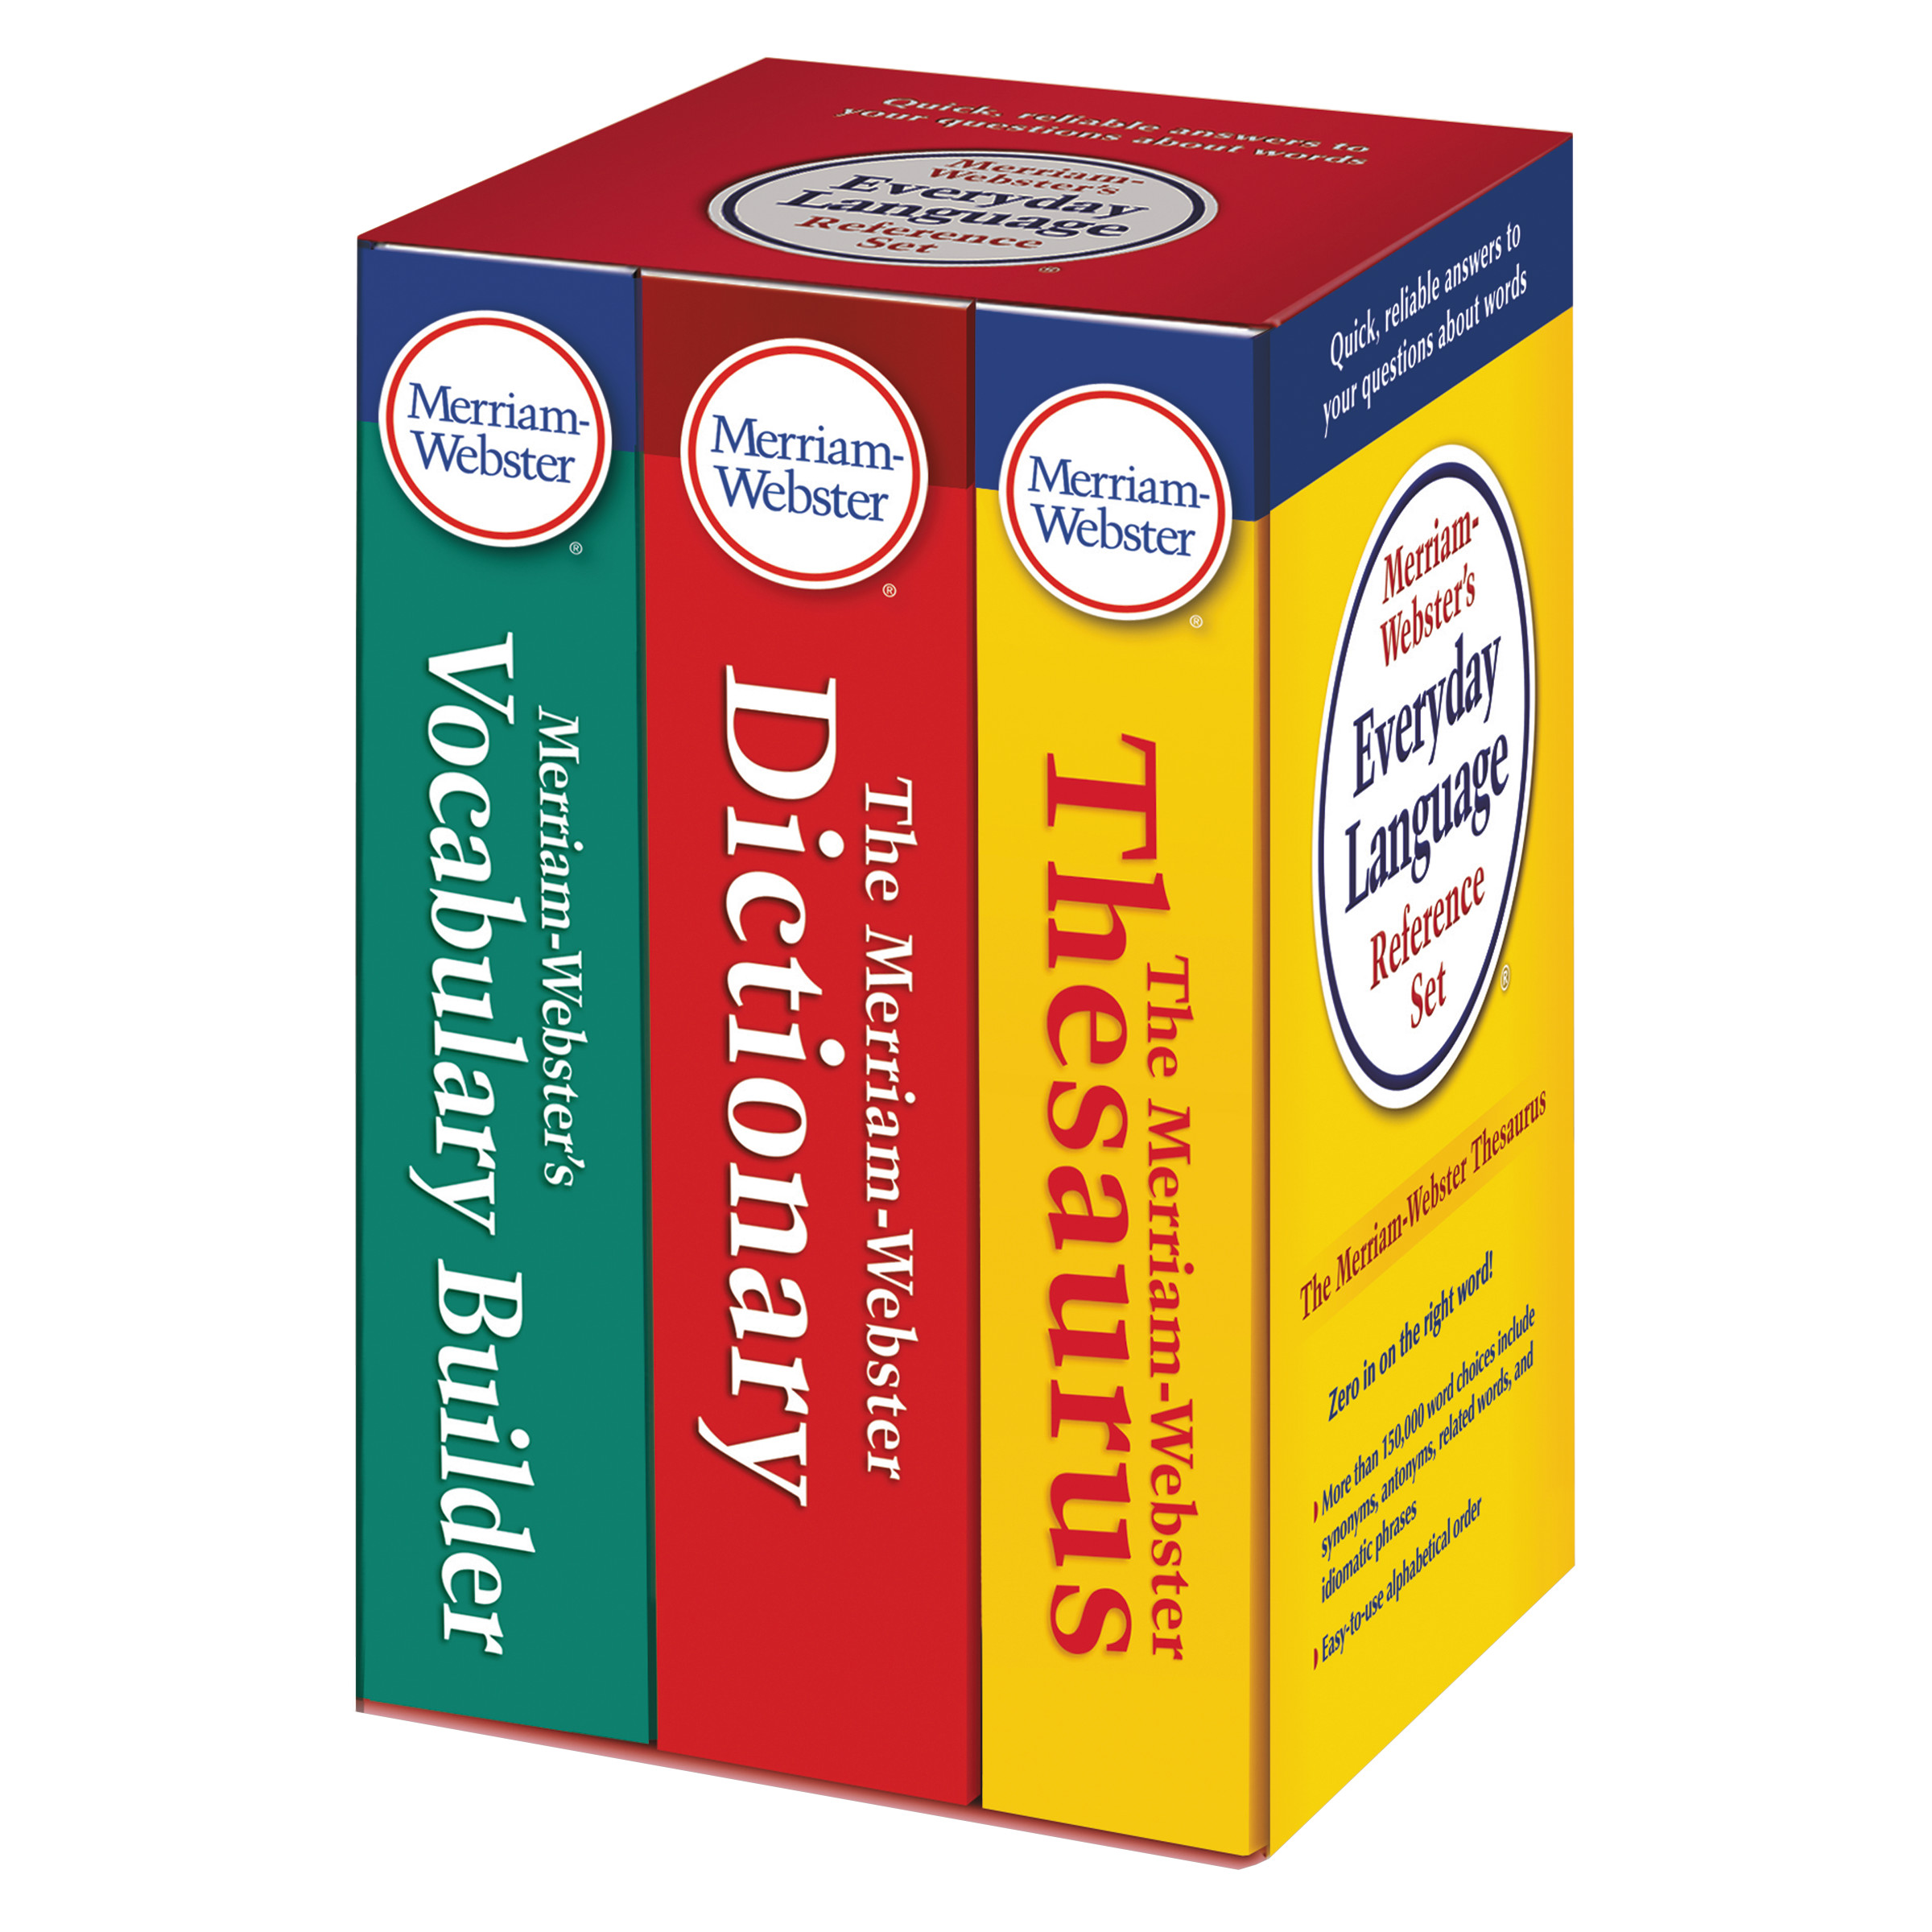 Merriam Webster Everyday Language Reference Set, Dictionary, Thesaurus,  Vocabulary Builder - Walmart.com